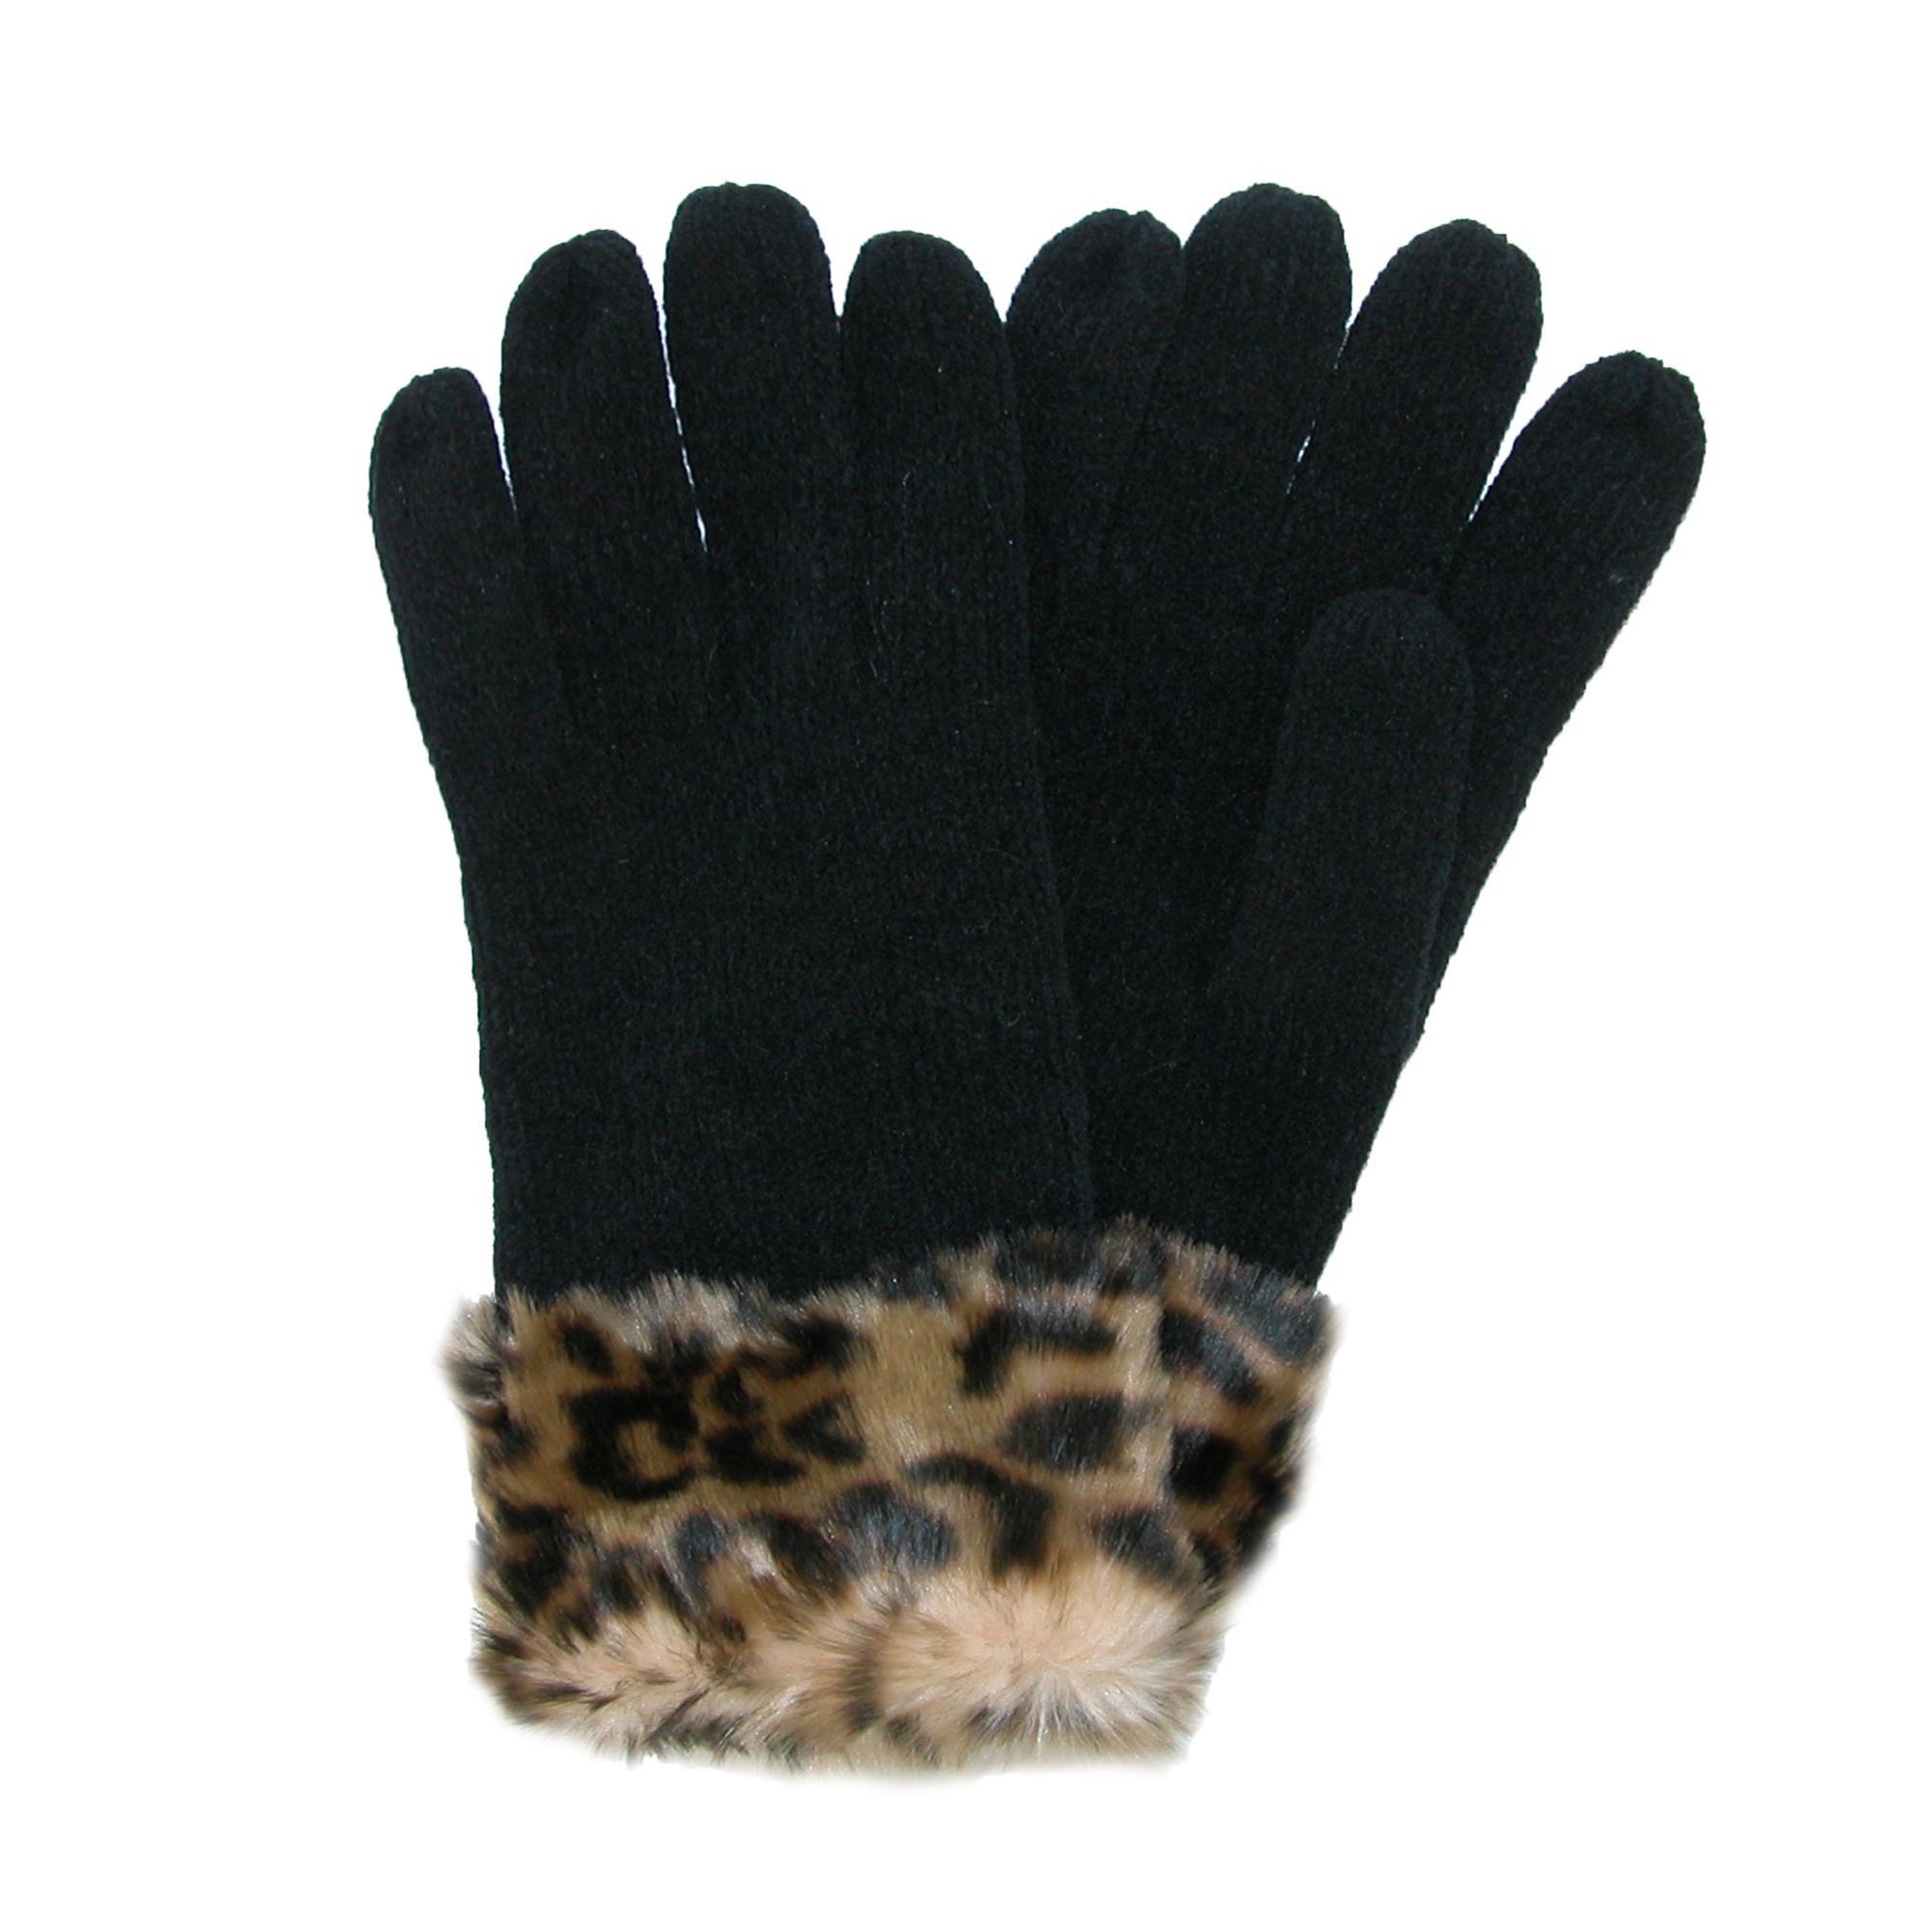 Gofit Womens X-trainer - Glove Medium - 1 Ea.